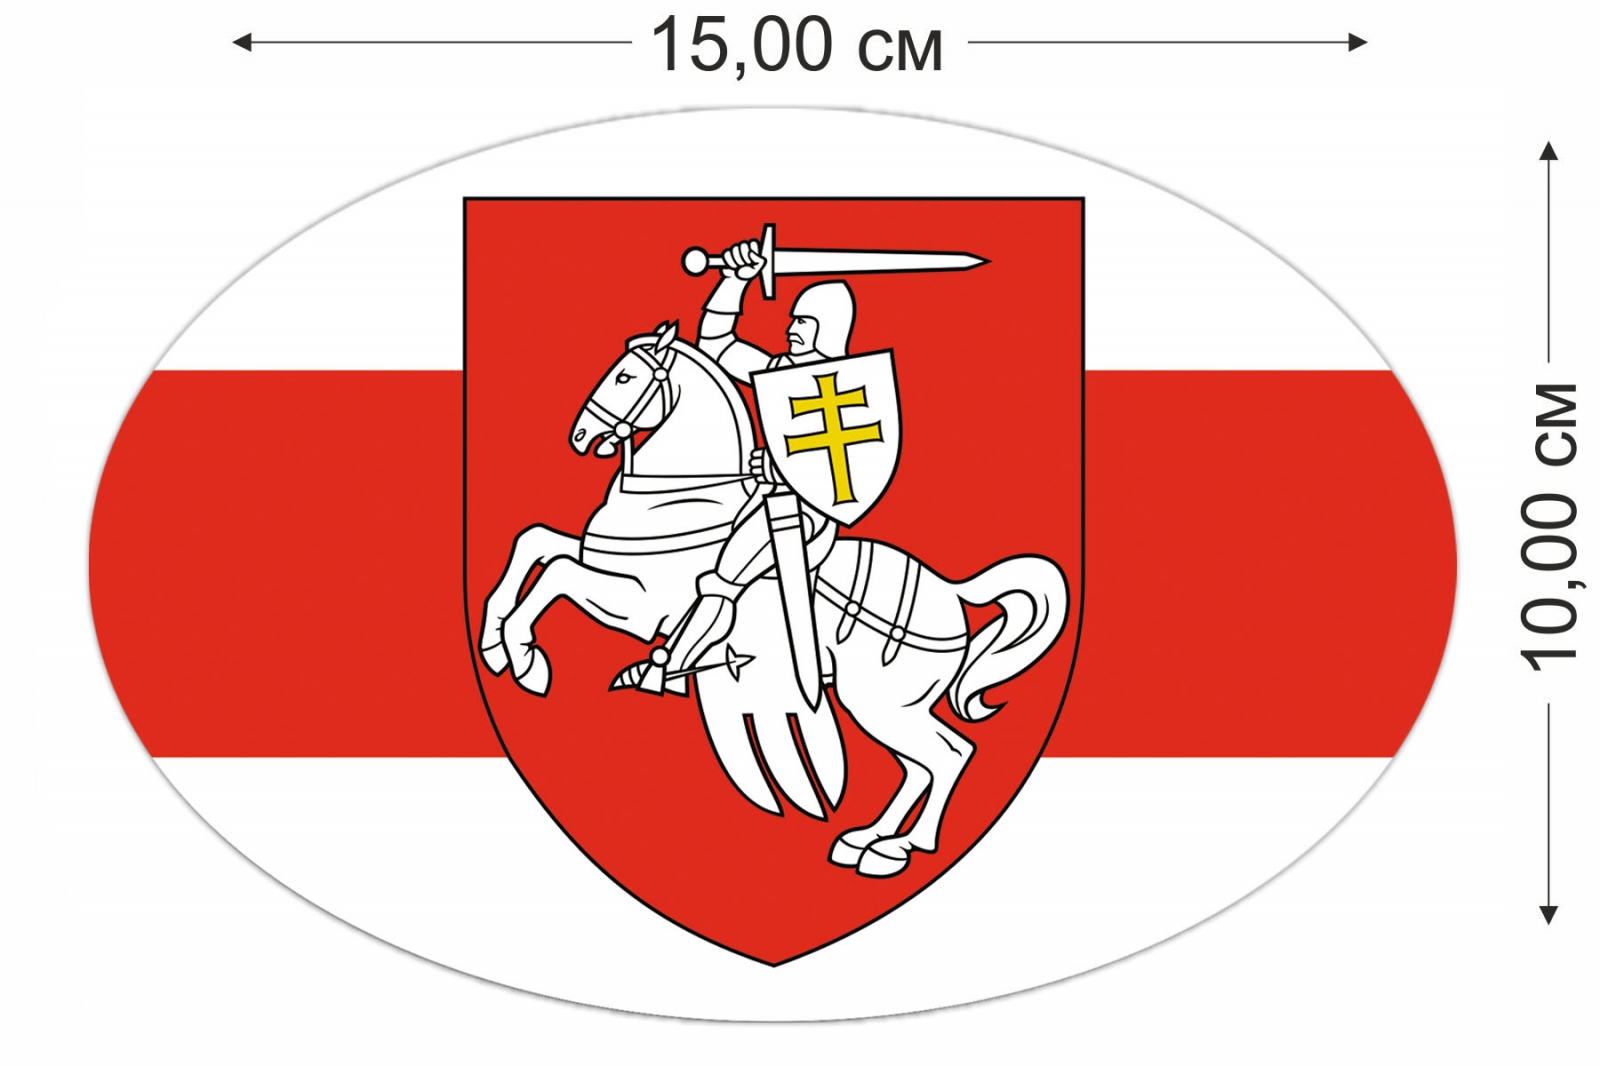 Наклейка на машину с Погоней и флагом Беларуси